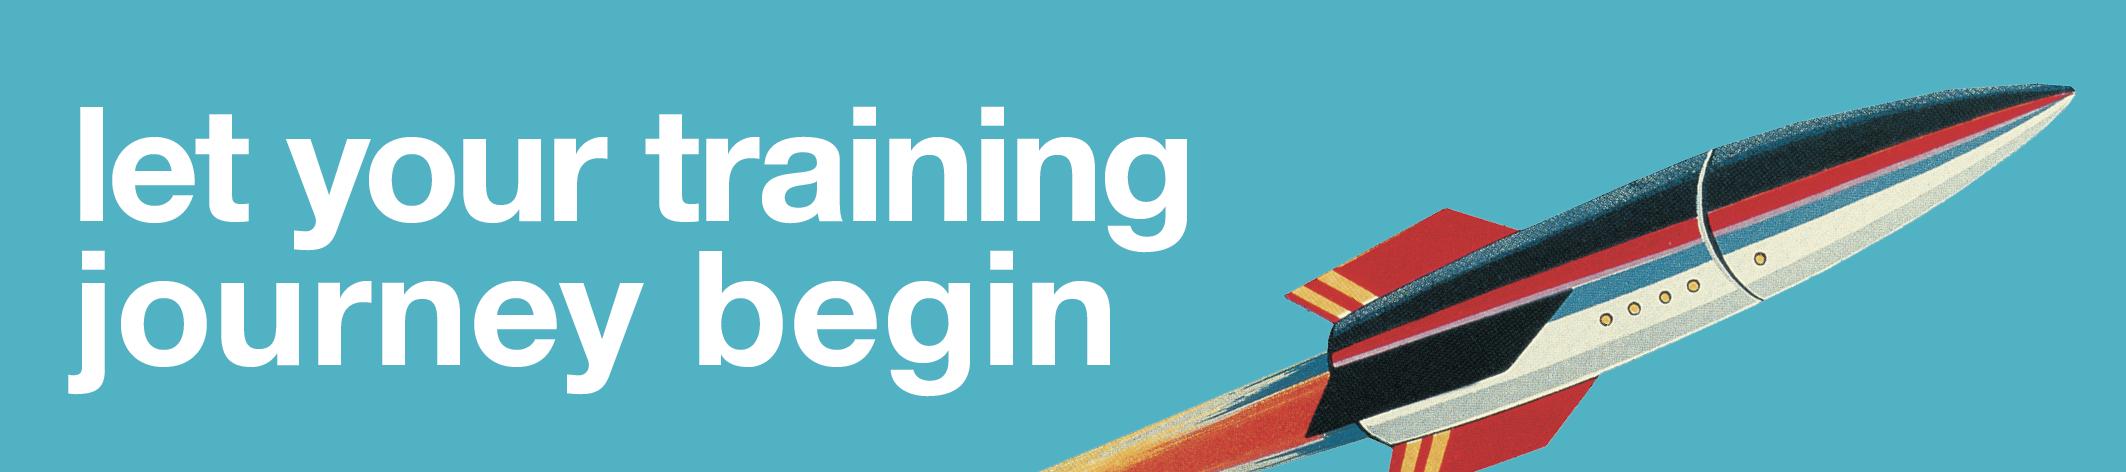 Let your training journey begin